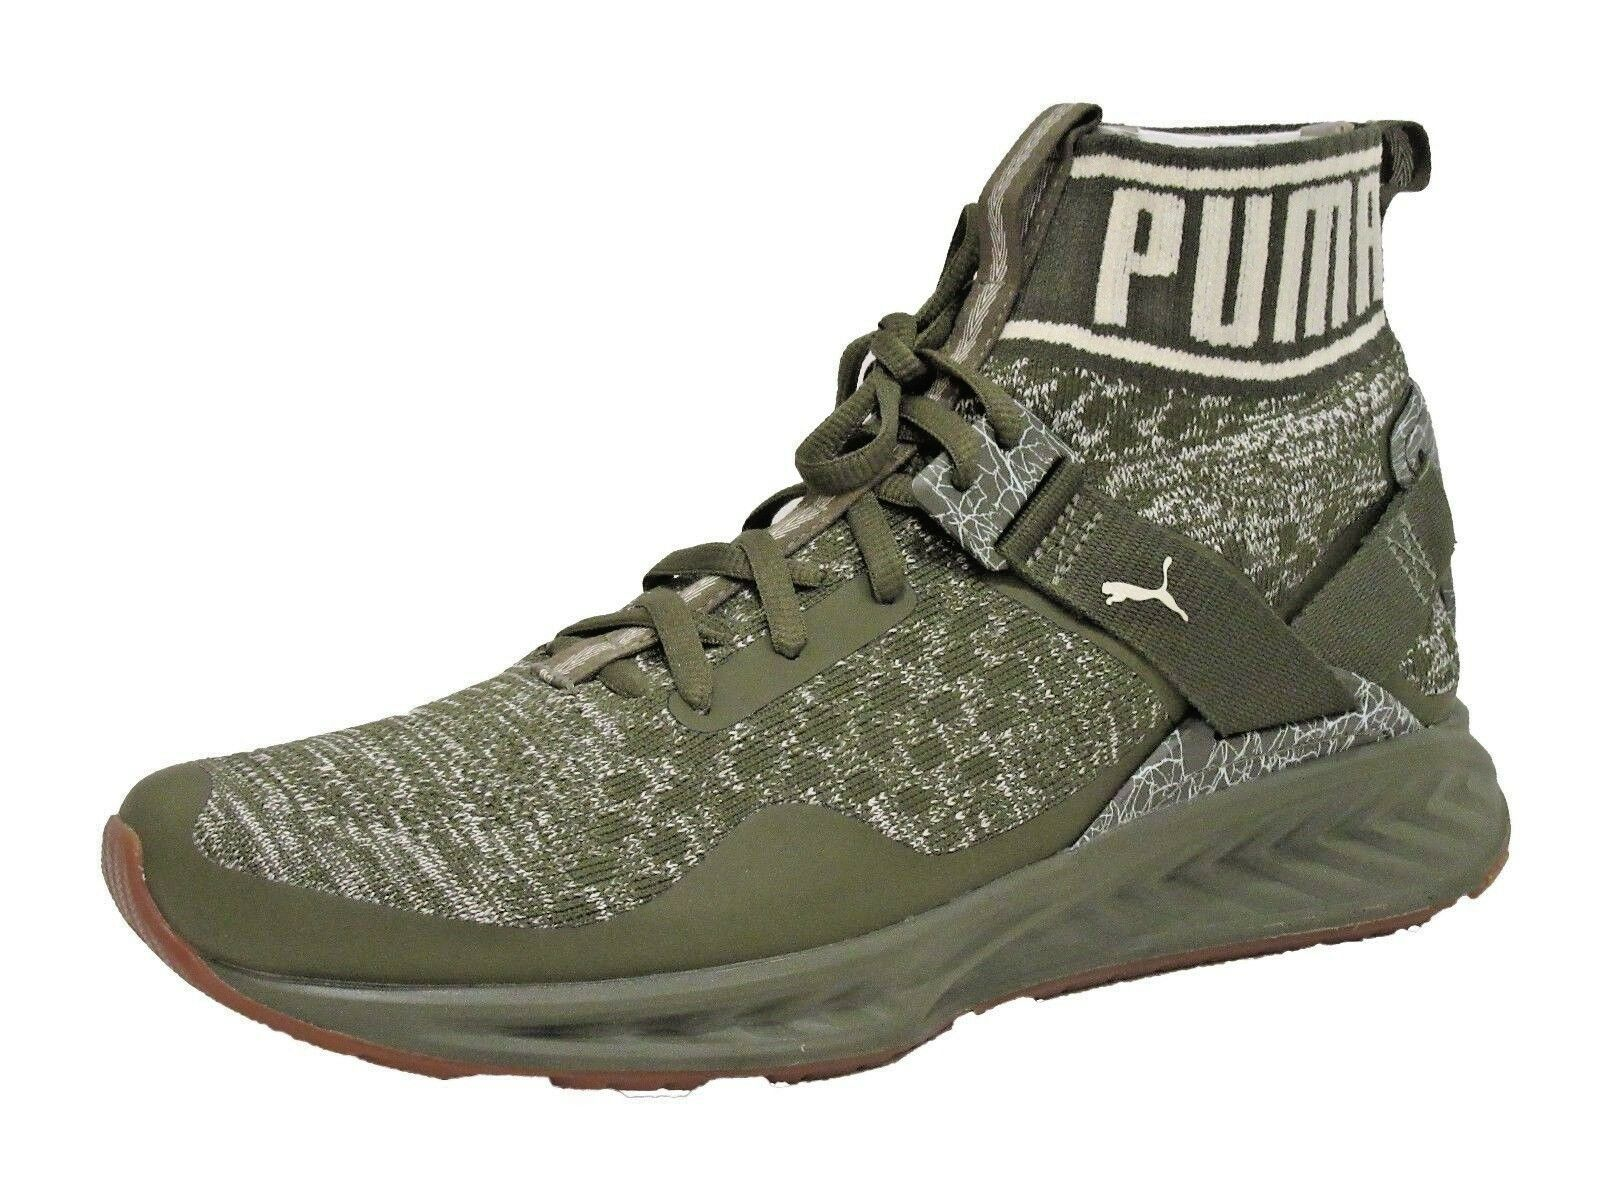 PUMA Men's Ignite Evoknit Hypernature Sneaker, Olive Night-Birch White